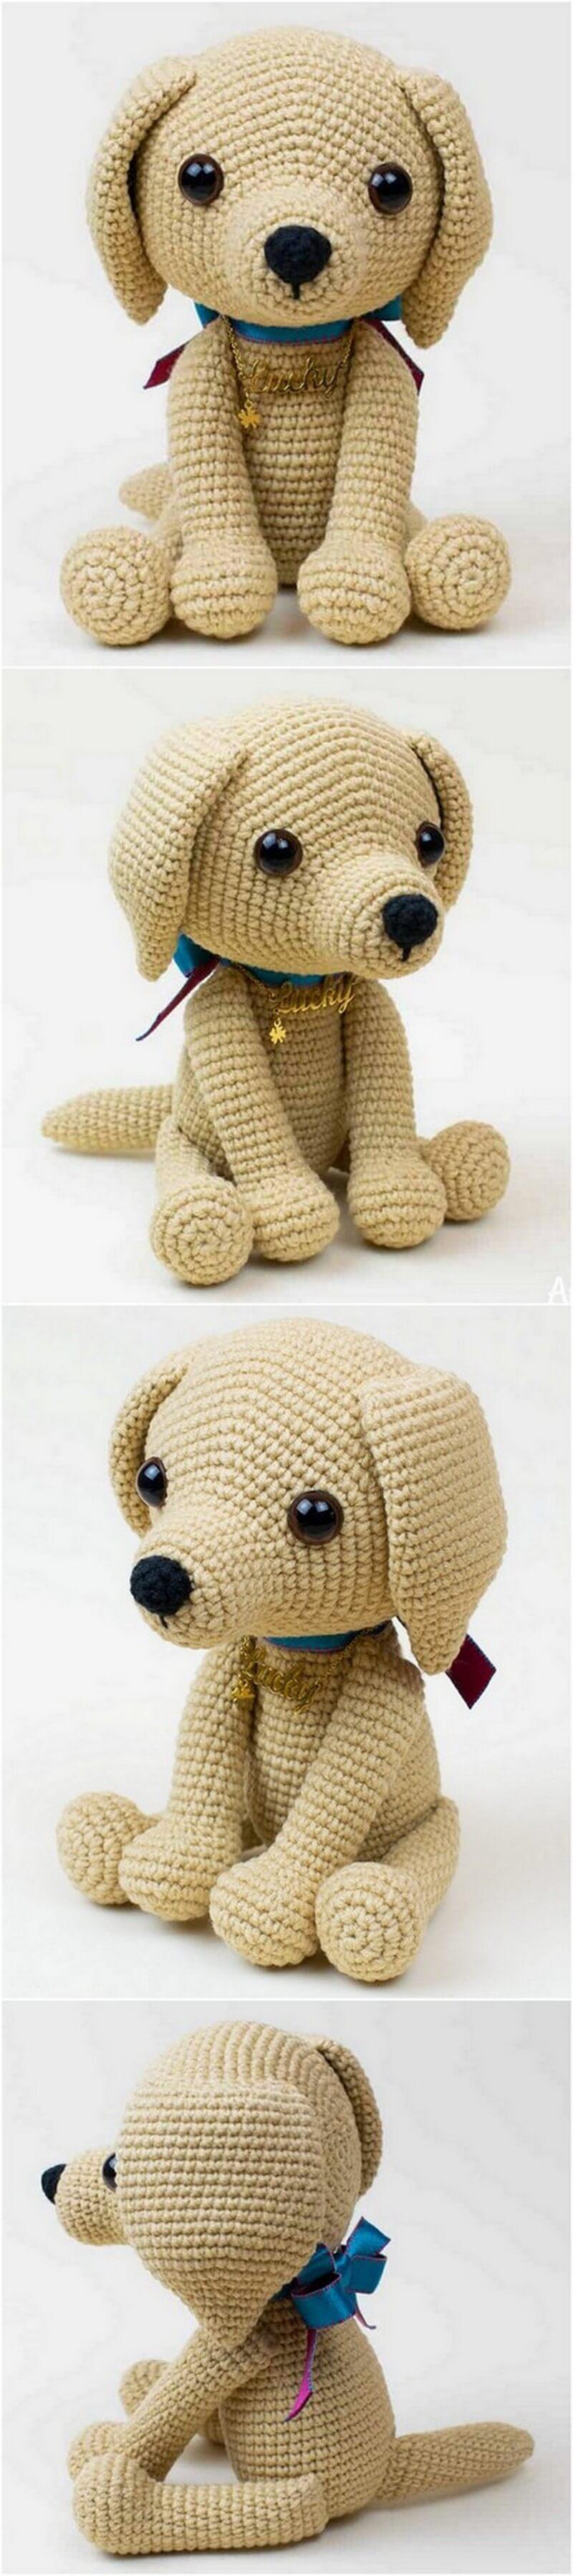 Crochet Amigurumi Pattern (25)